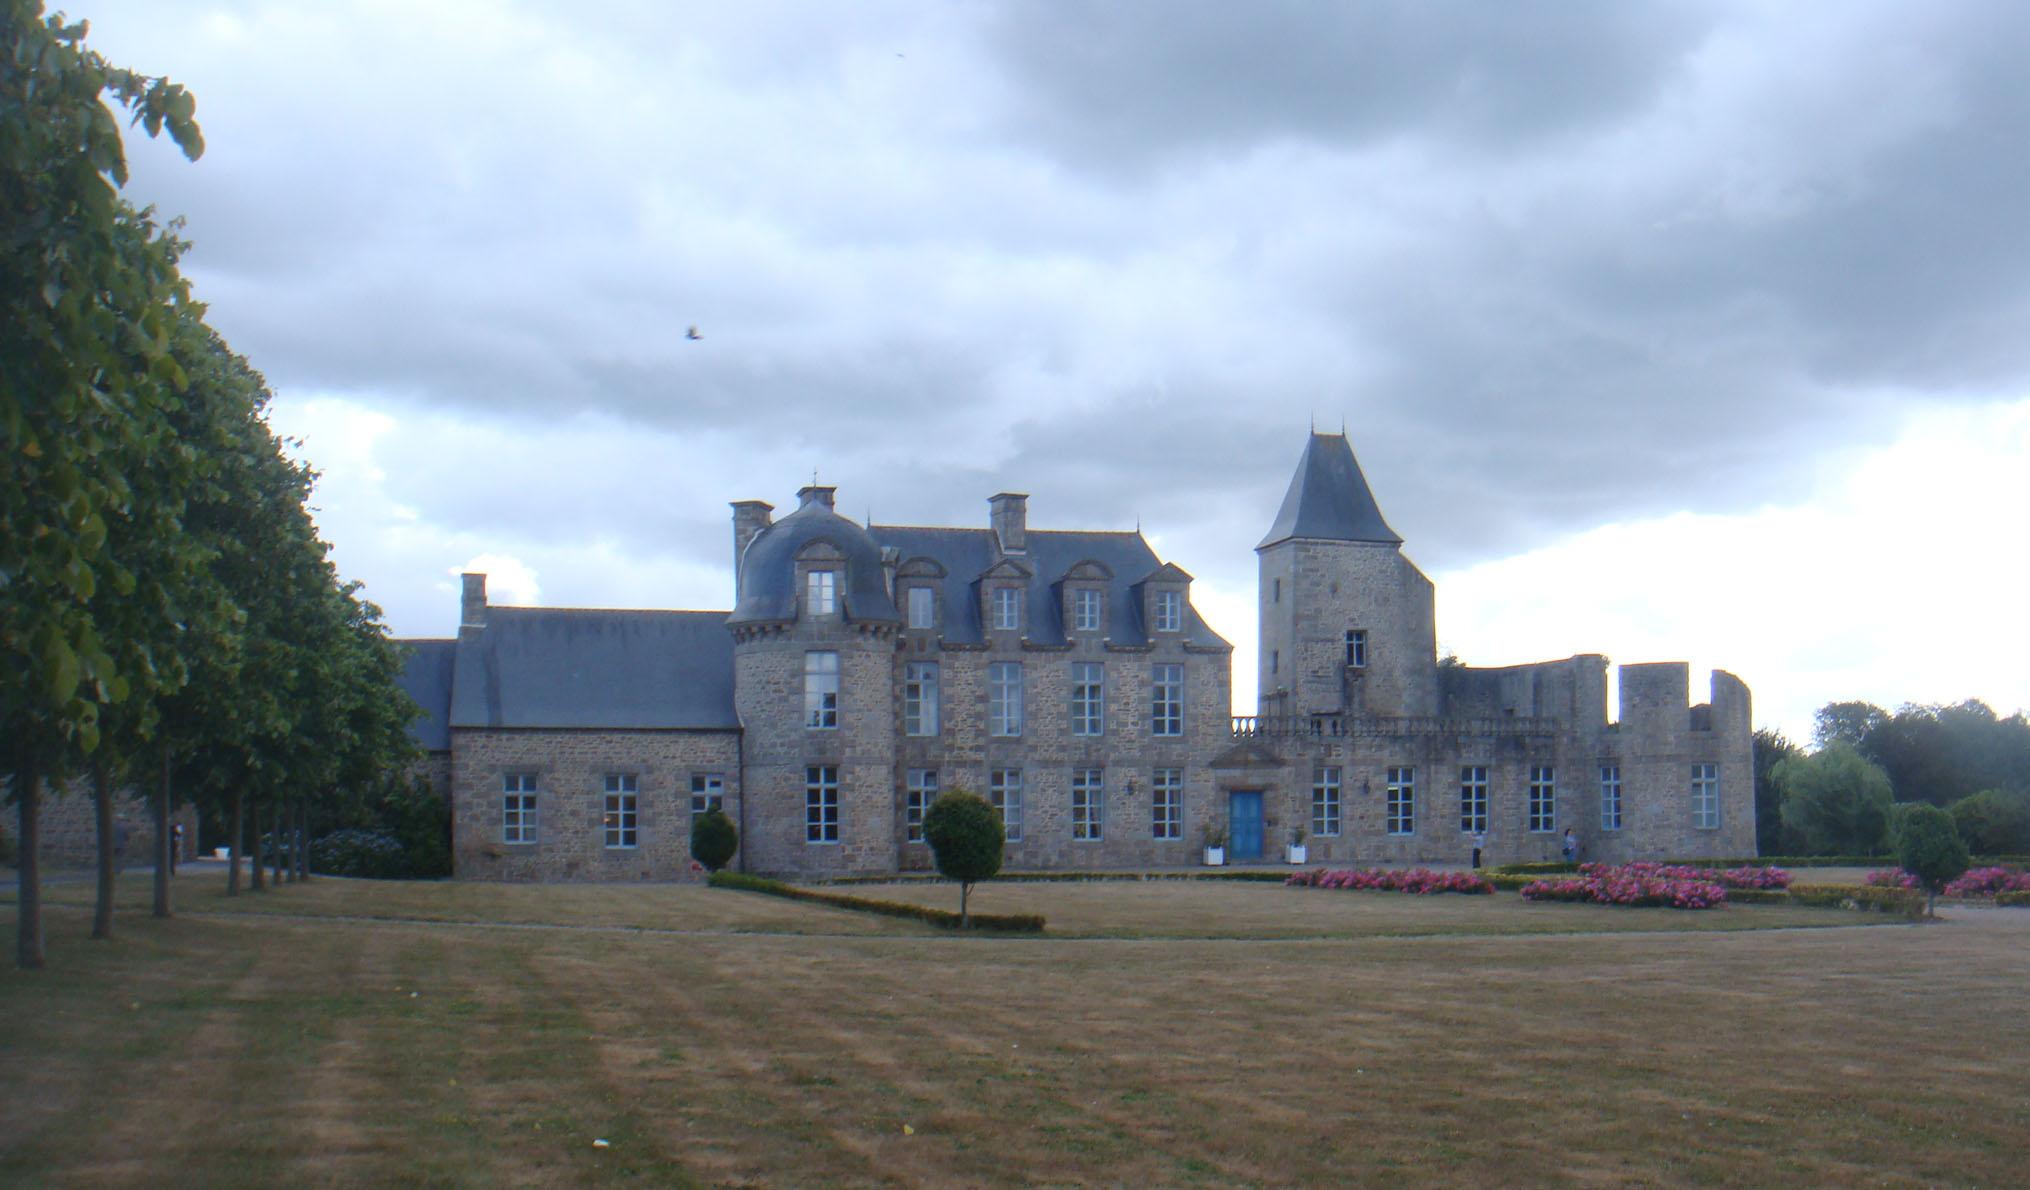 File Ch u00e2teau du Bois Guy jpg Wikimedia Commons # Le Chateau Du Bois